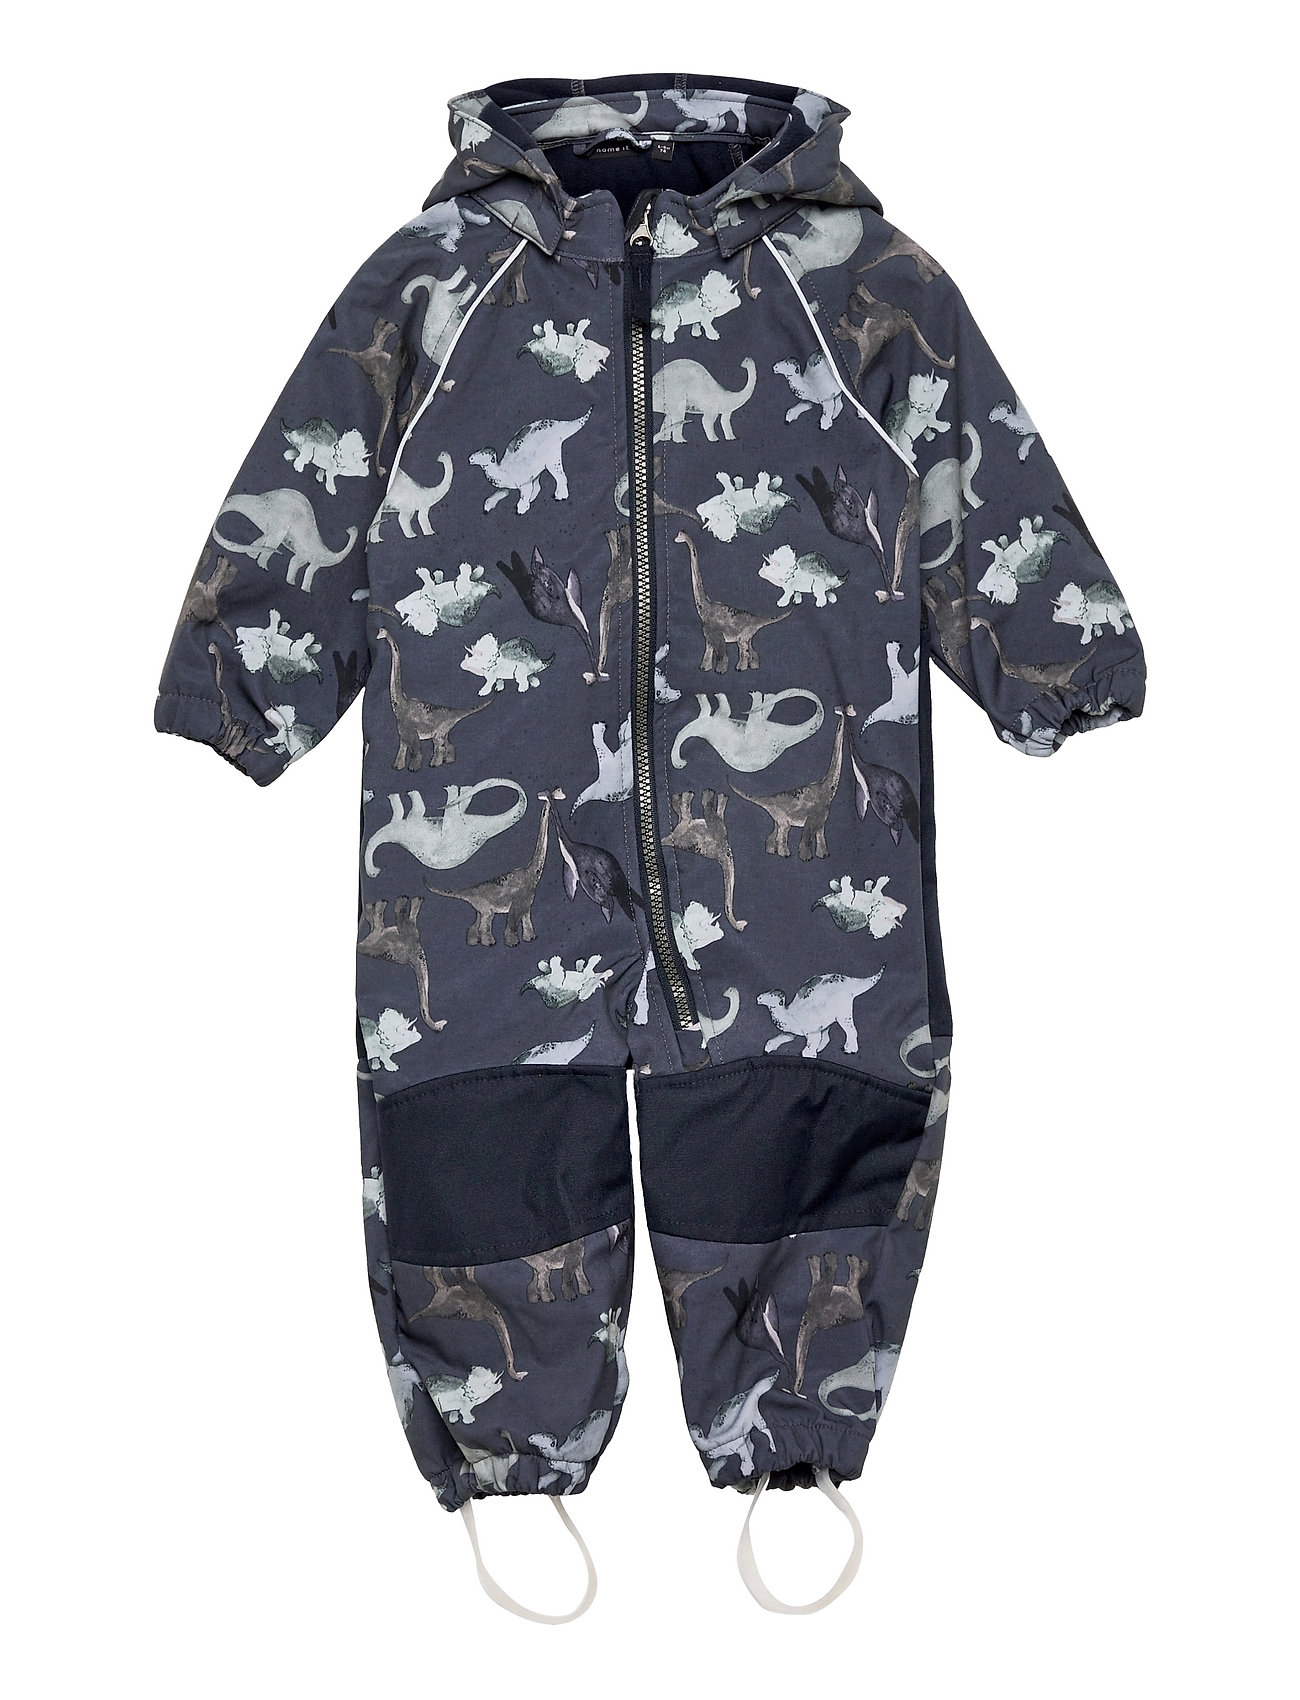 Nmmalfa Suit Dino Fo Outerwear Rainwear Sets & Coveralls Blå Name It